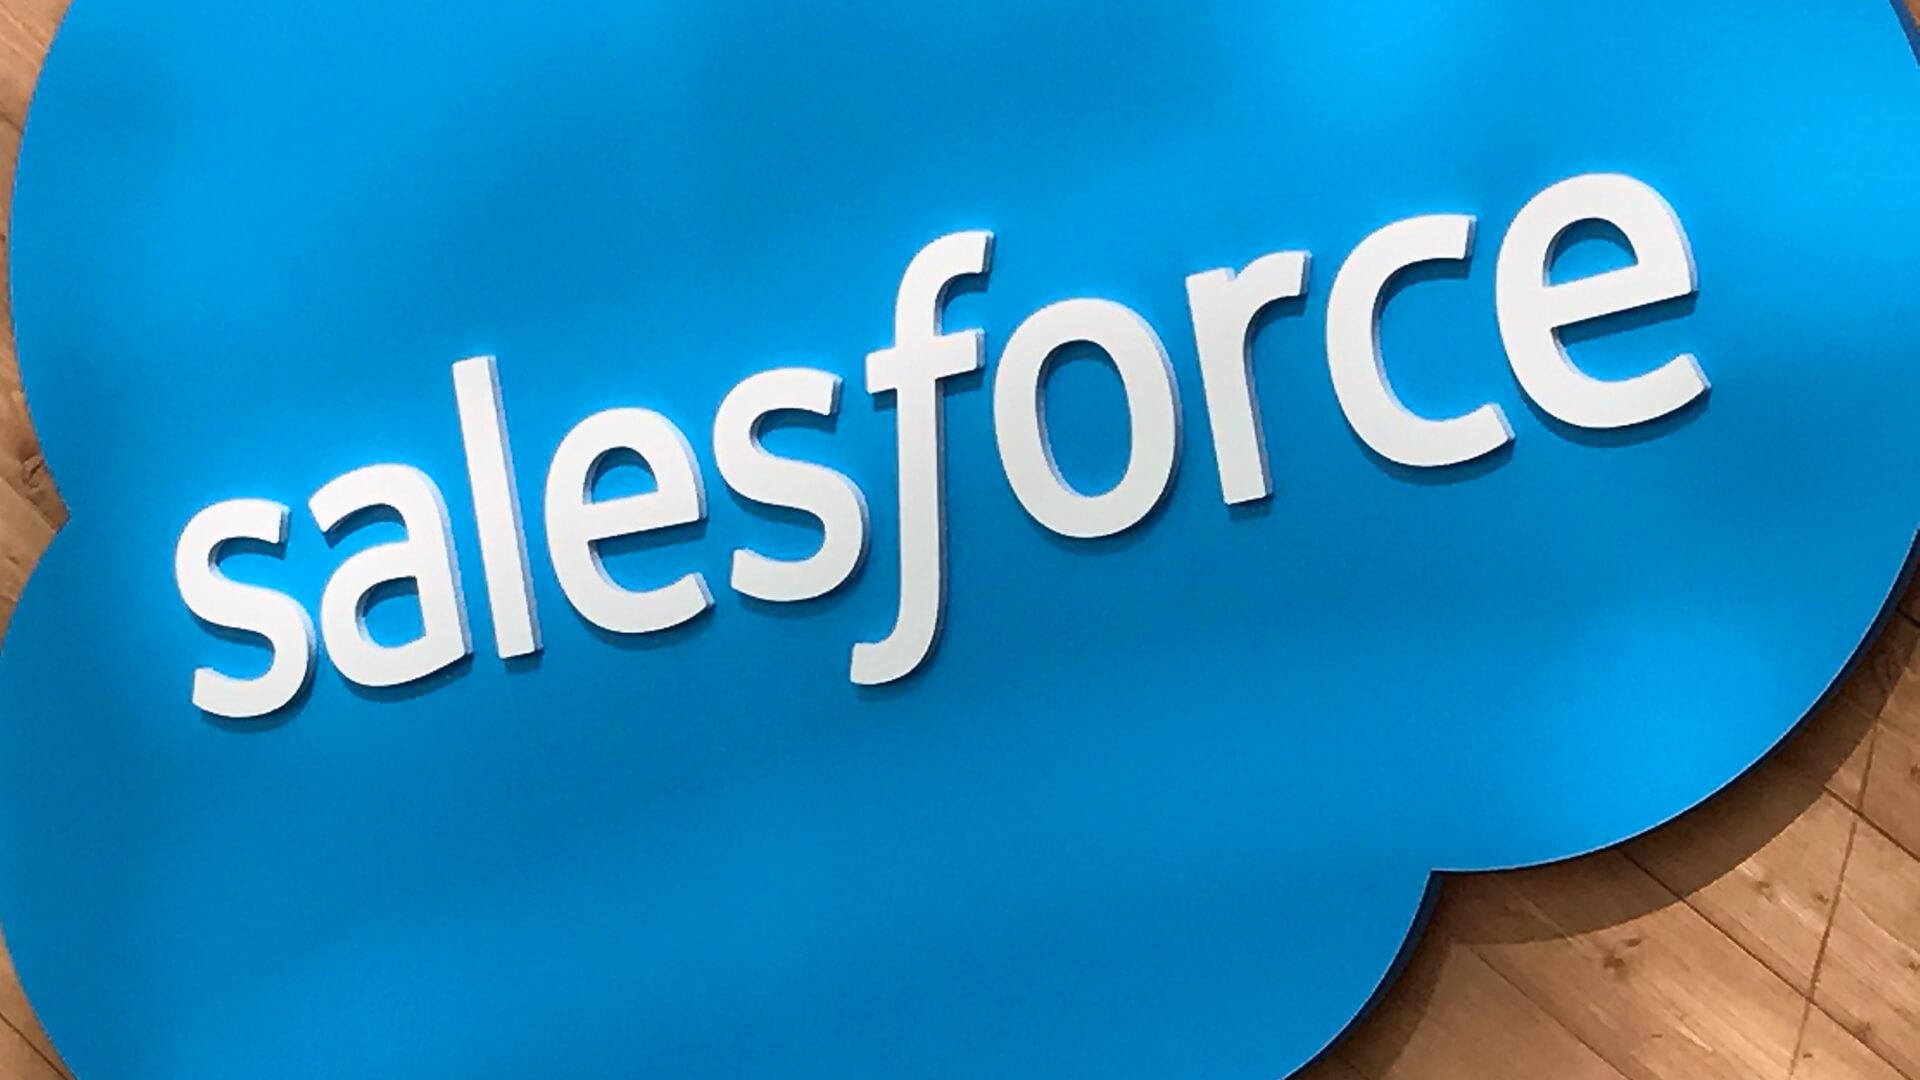 salesforce-logo-sign1-1920